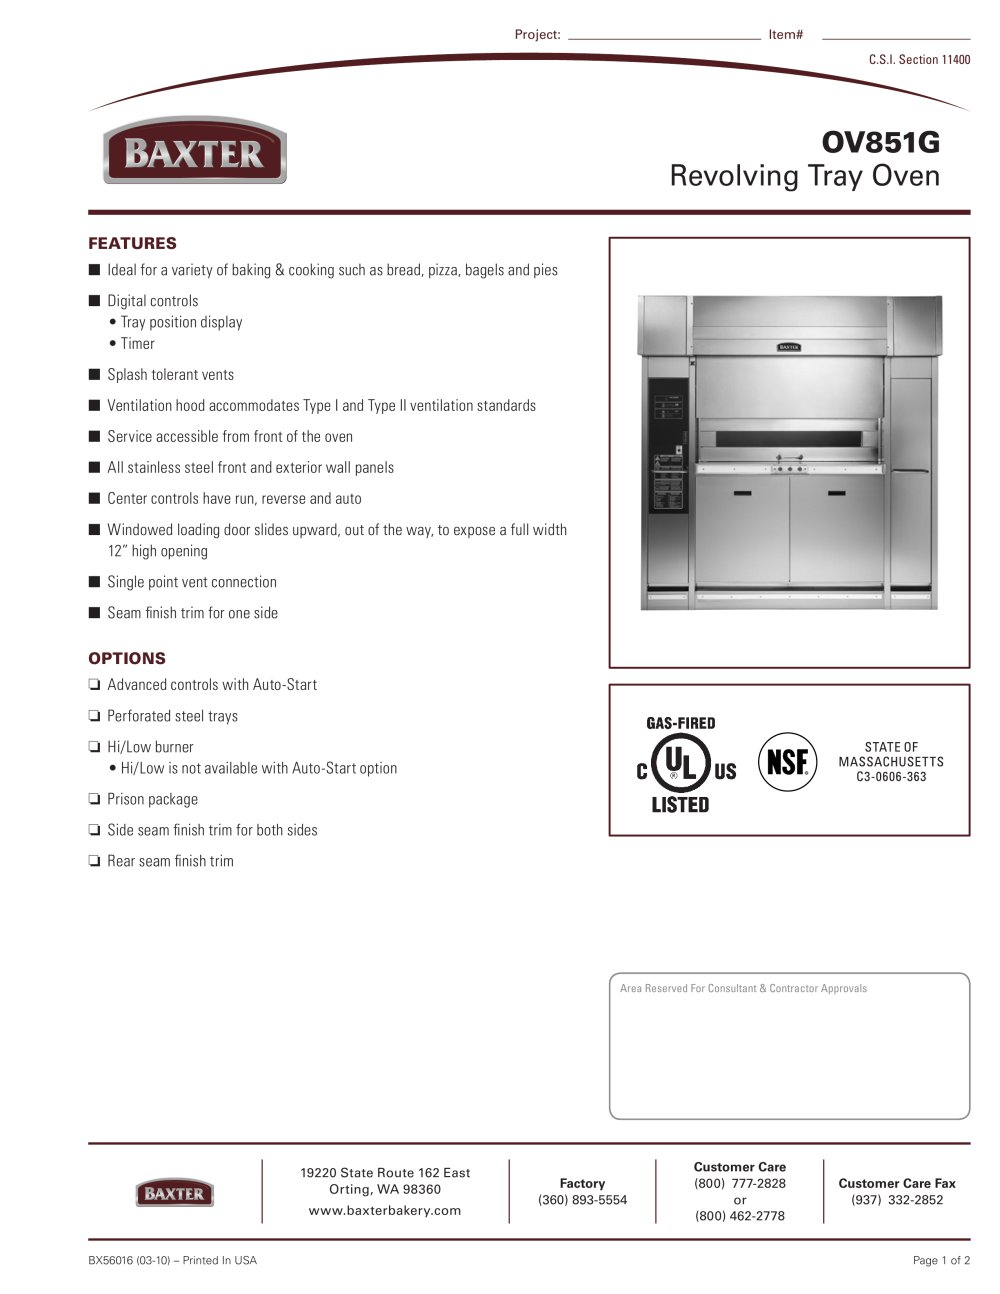 baxter oven wiring schematic oven best wiring library